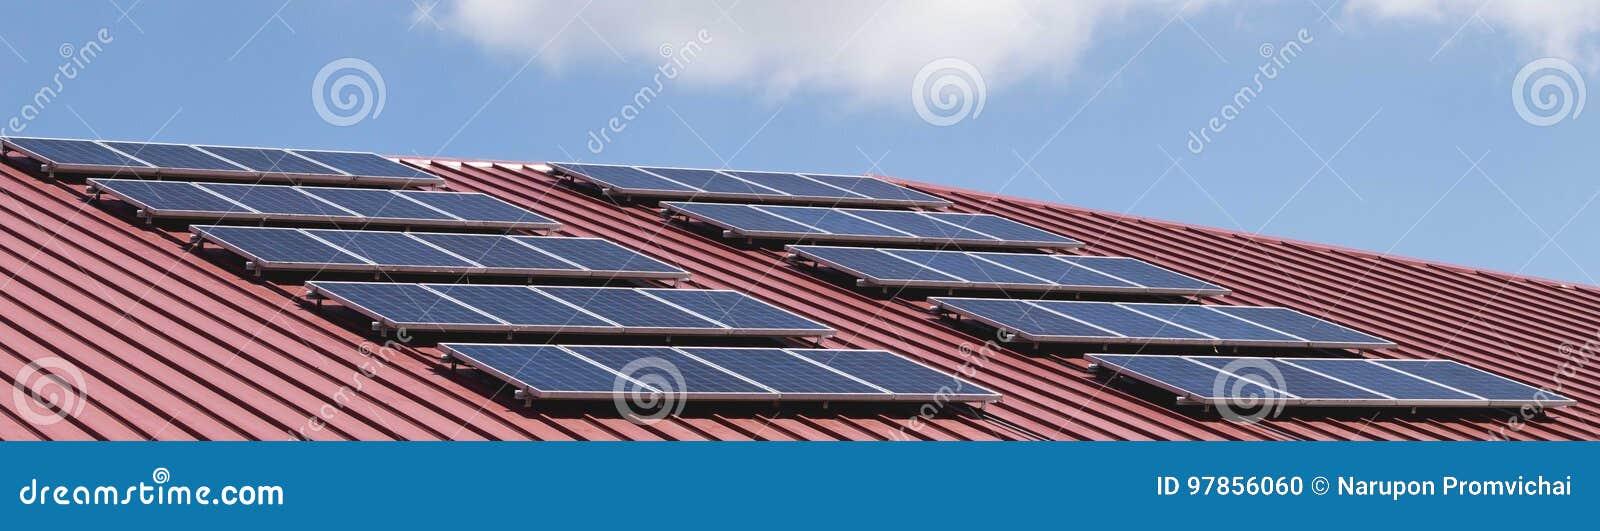 Modelo del panel solar en la teja de tejado roja